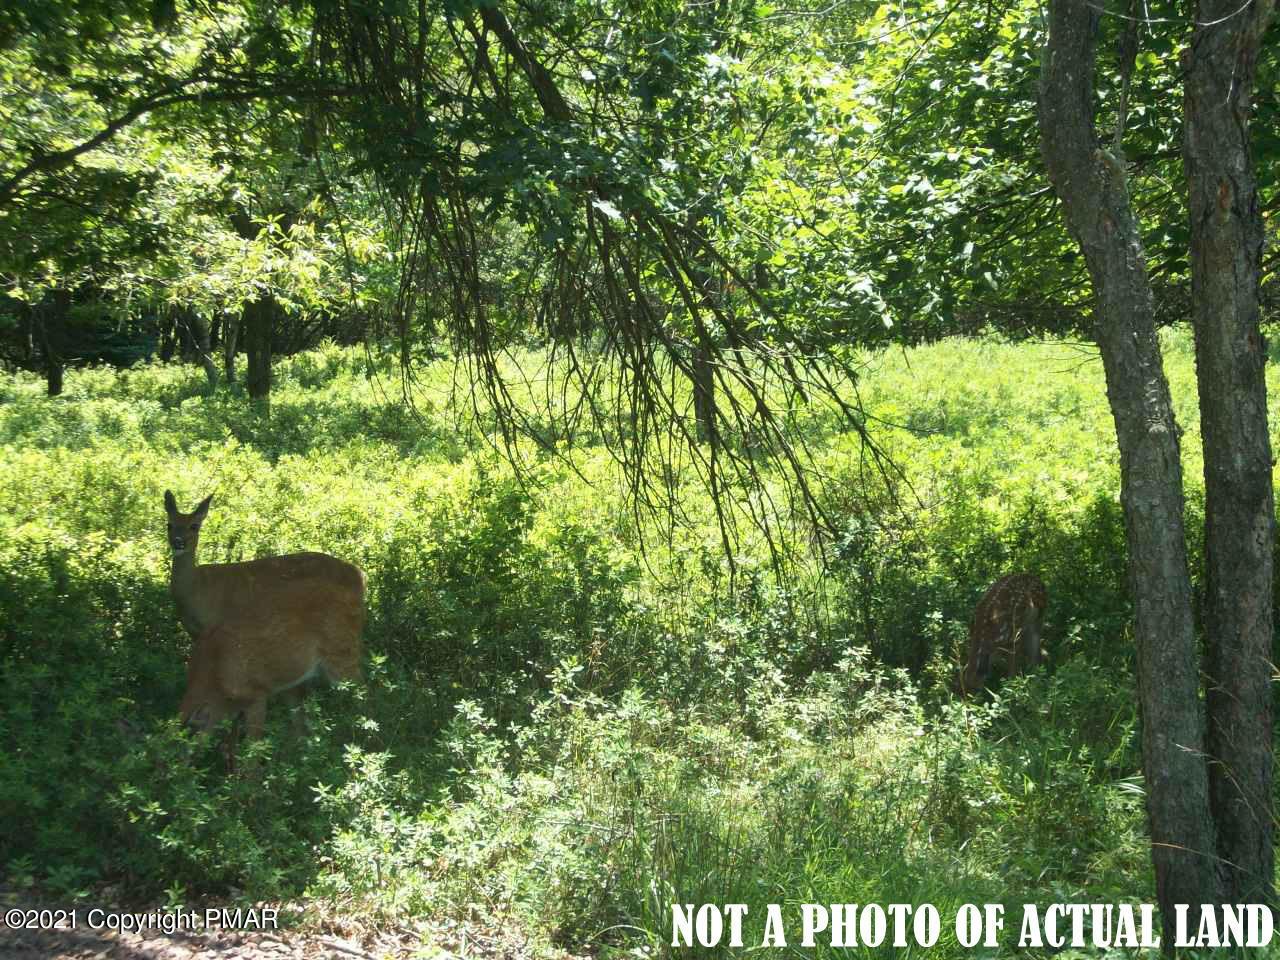 PENDING!!!! B616 Towamensing Trail, Albrightsville, PA, 18210 United States